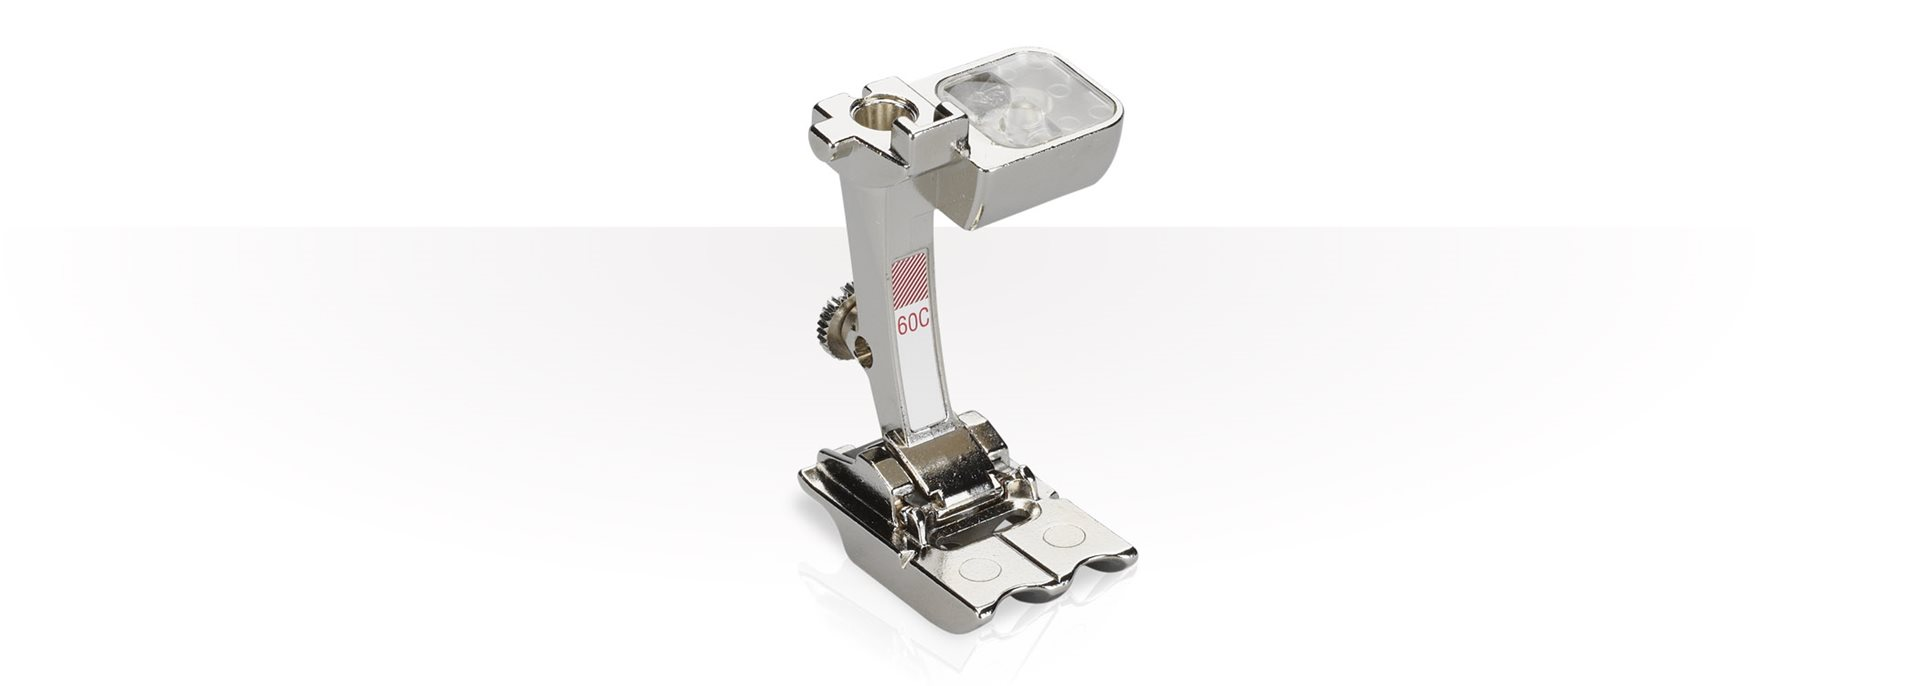 Bernina #60C Double Cord Foot 7-8mm